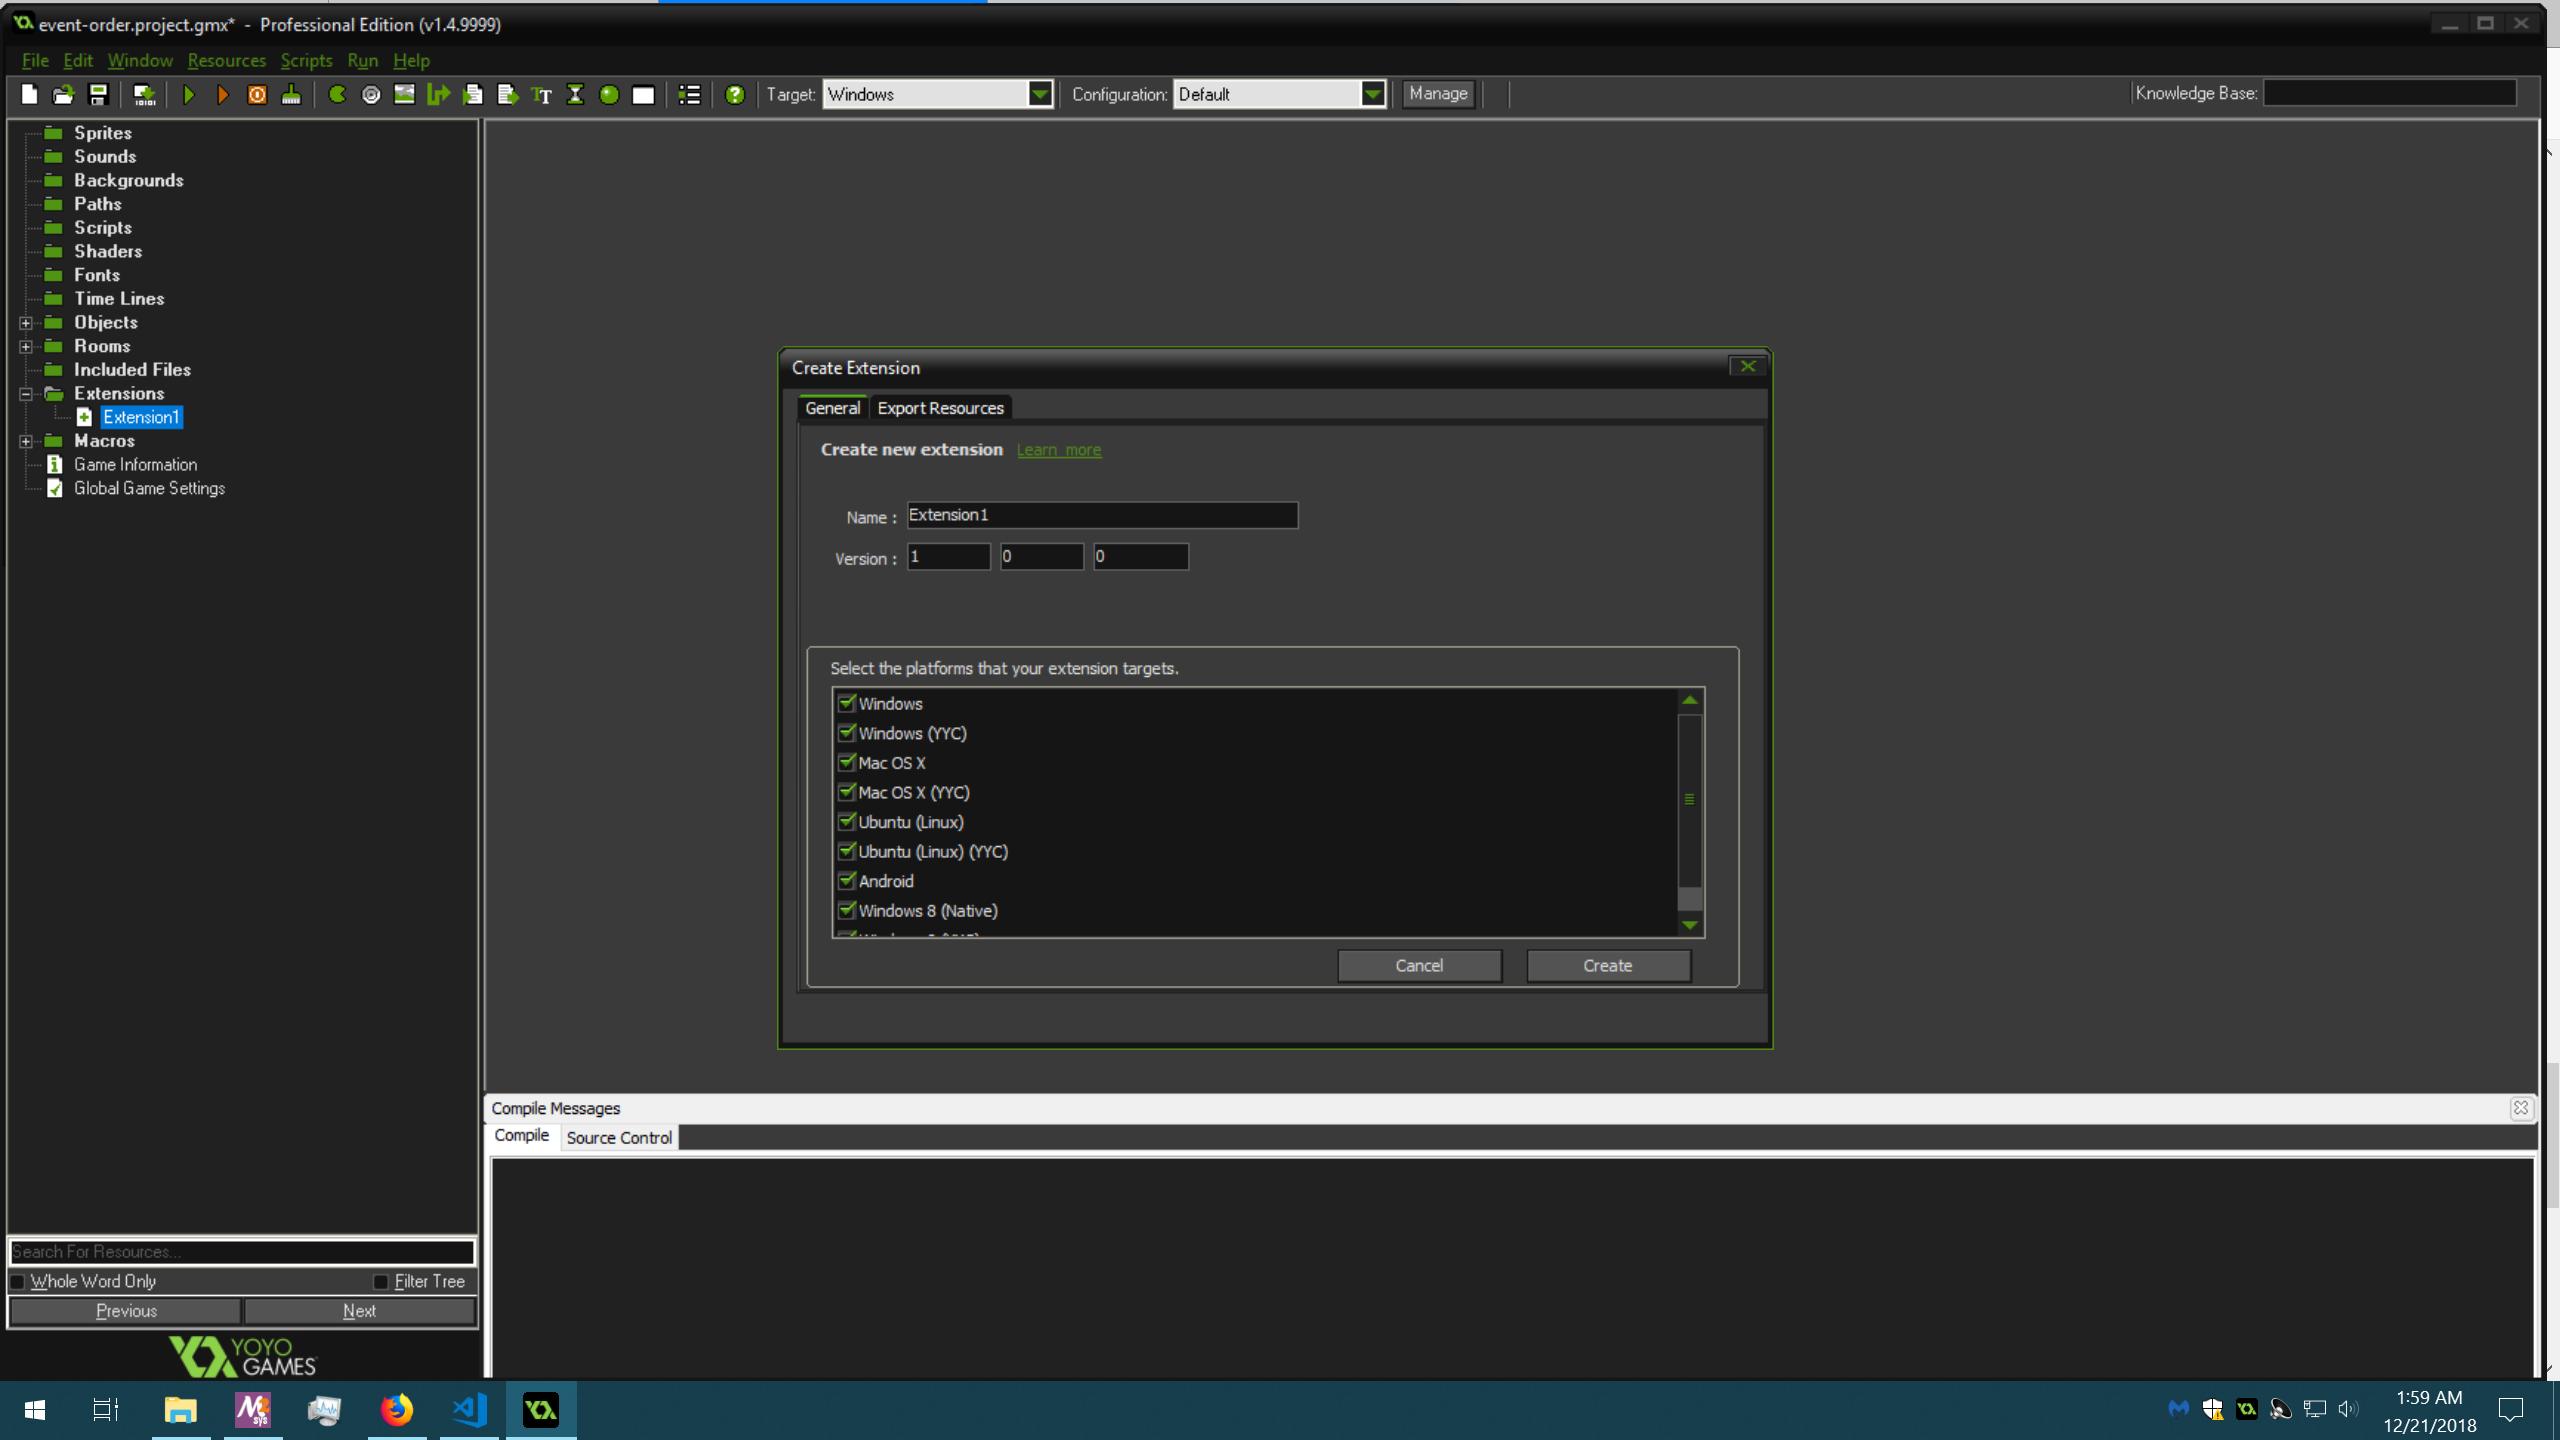 GMSv1.4 Create Extension